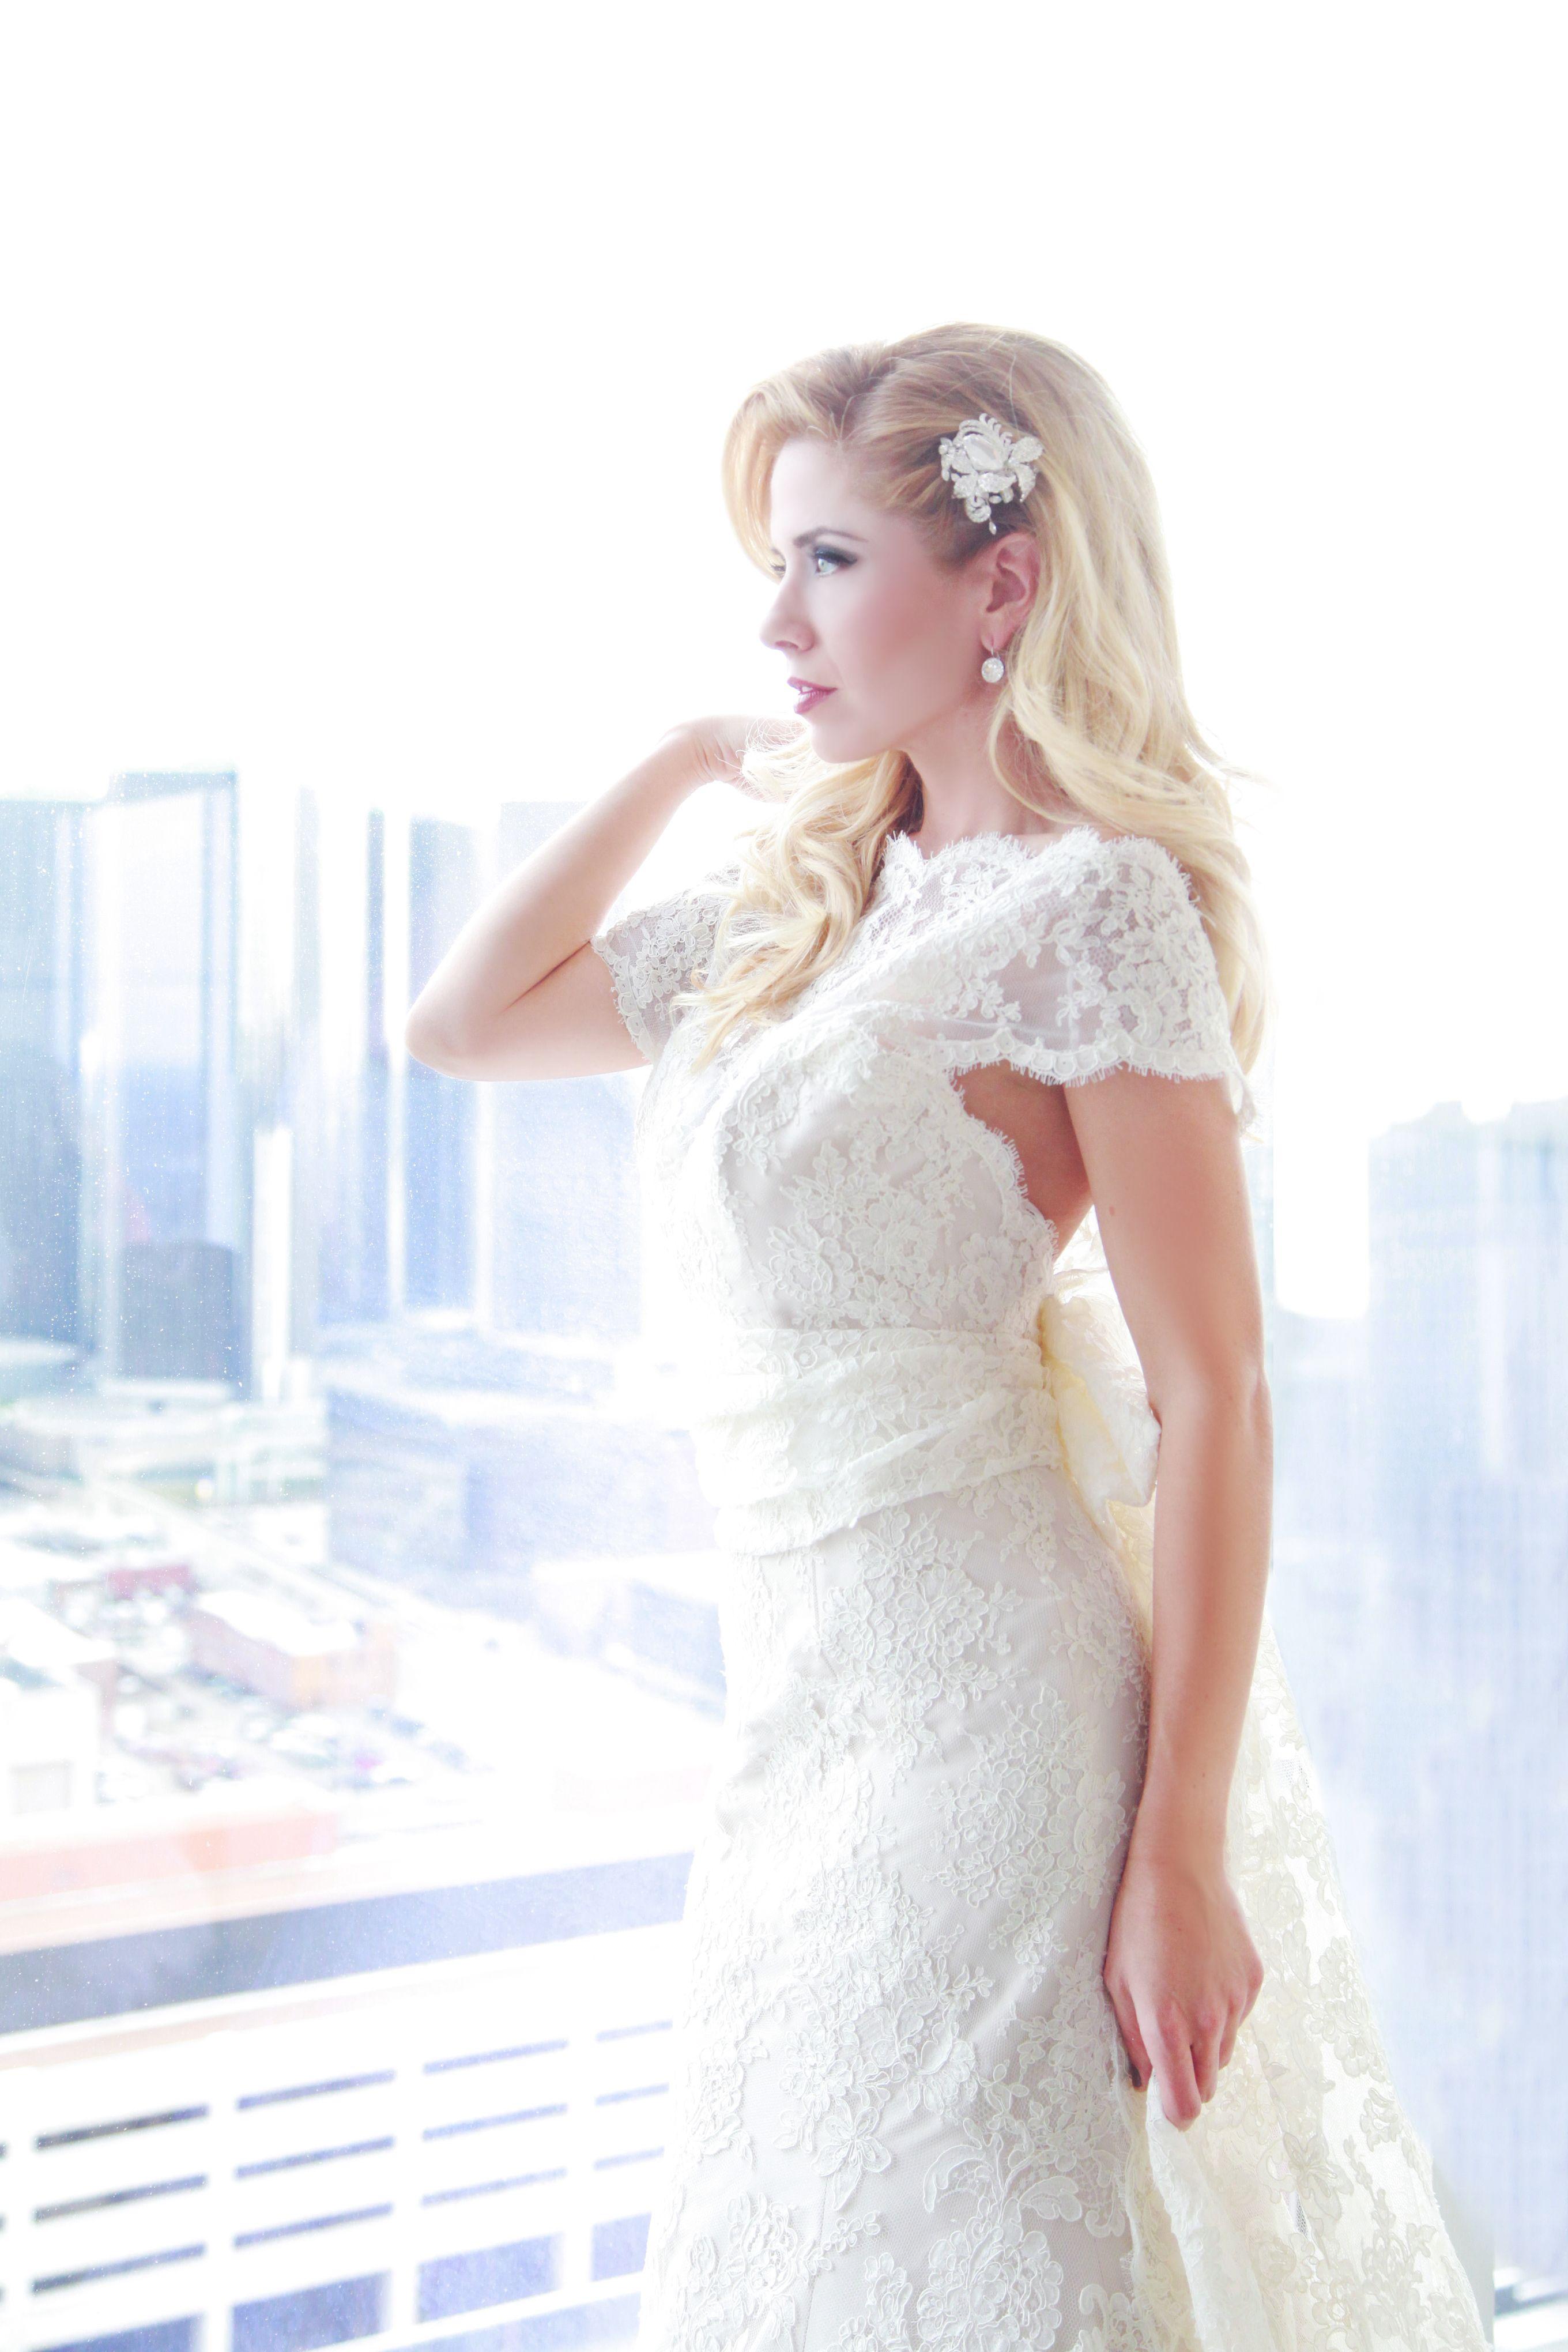 Bridal hair accessory bride wedding bridalhair